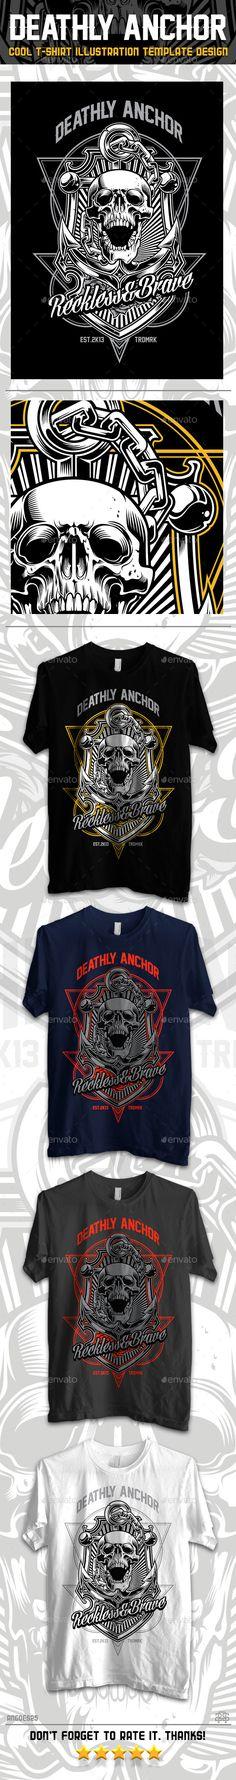 Deathly Anchor T-Shirt Vector illustration Design. Download: http://graphicriver.net/item/deathly-anchor/12497802?ref=ksioks